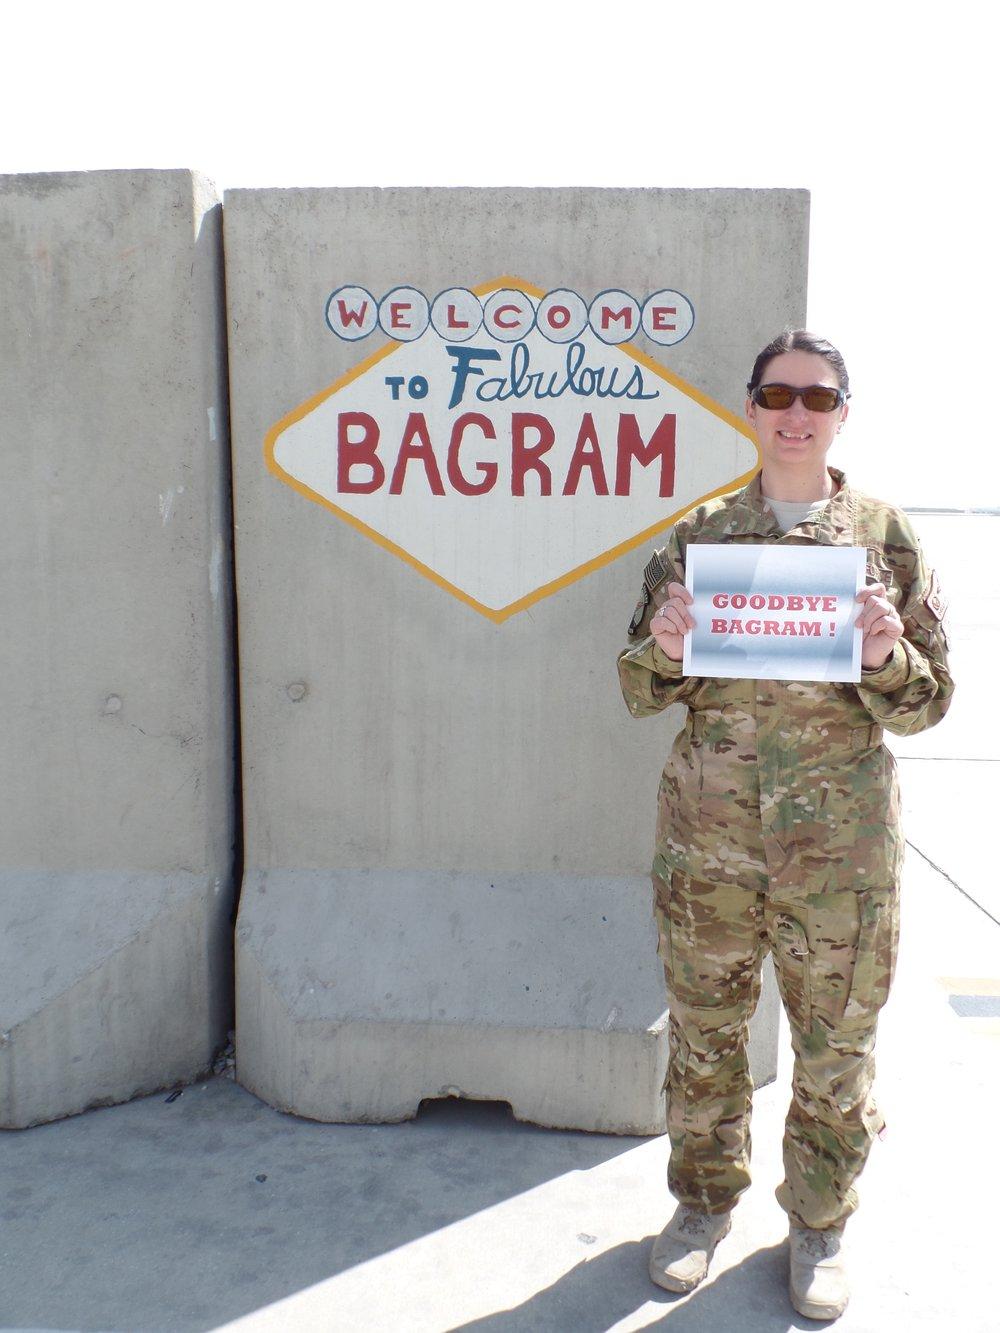 Leave Bagram.jpeg